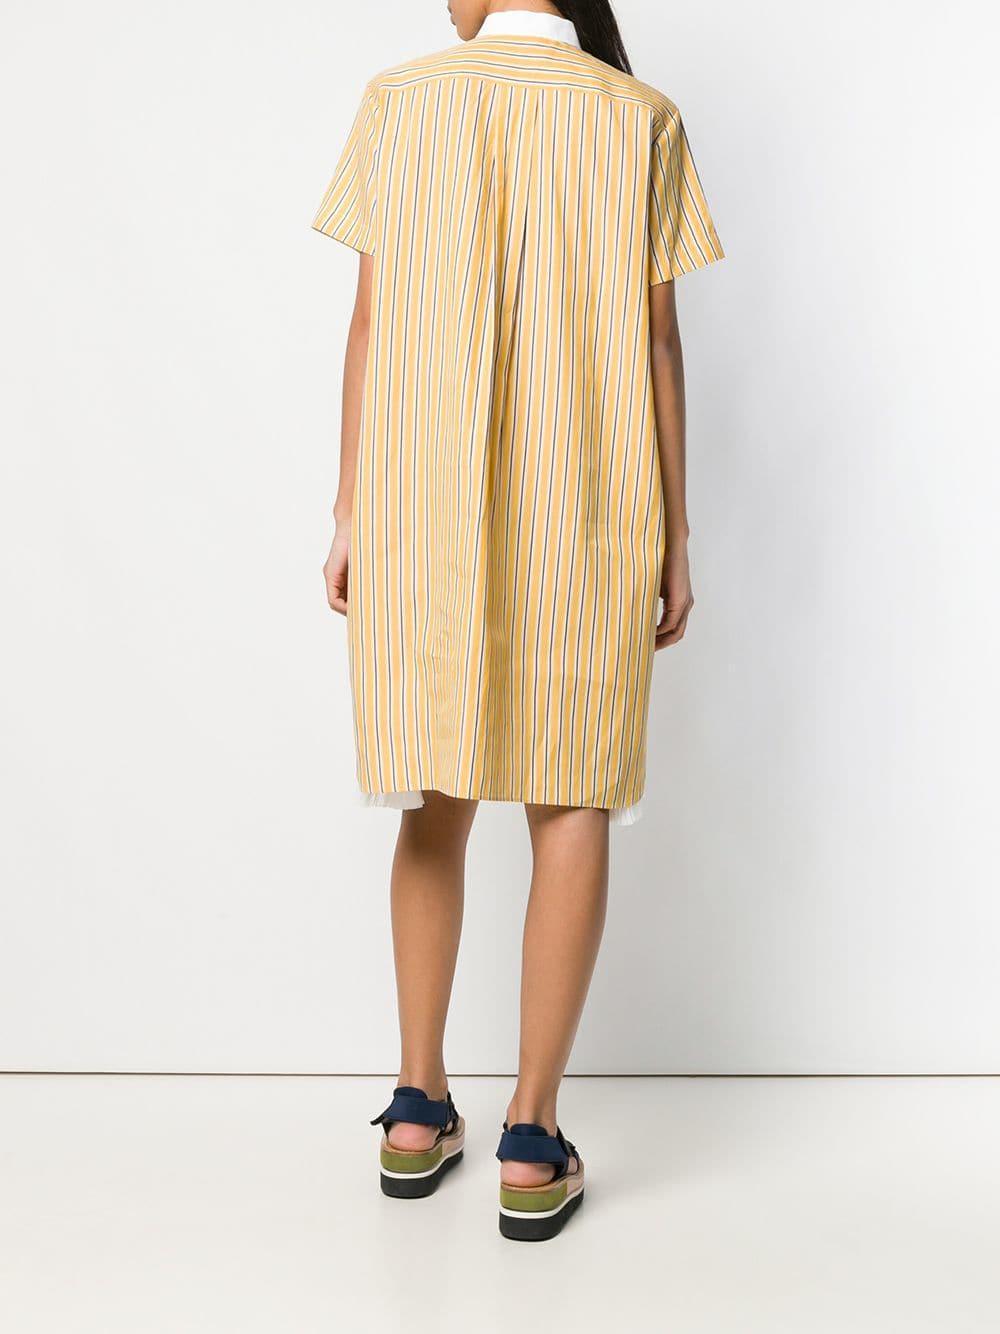 14e77c6803d72 Sacai - Yellow Striped Shirt Dress - Lyst. View fullscreen